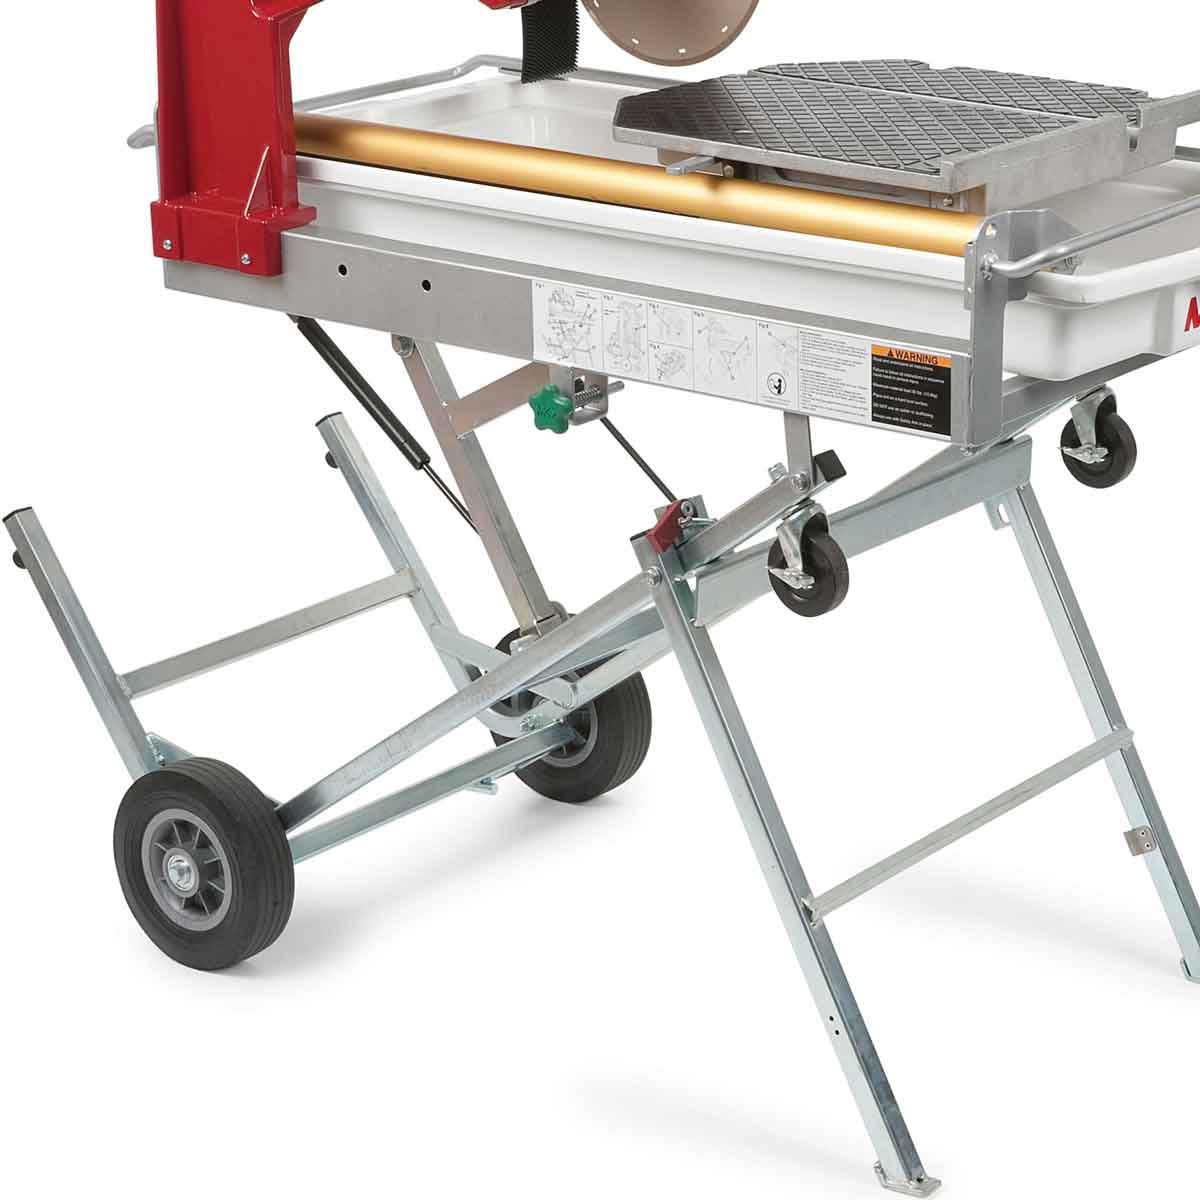 JCS factory mounted MK tile sastand